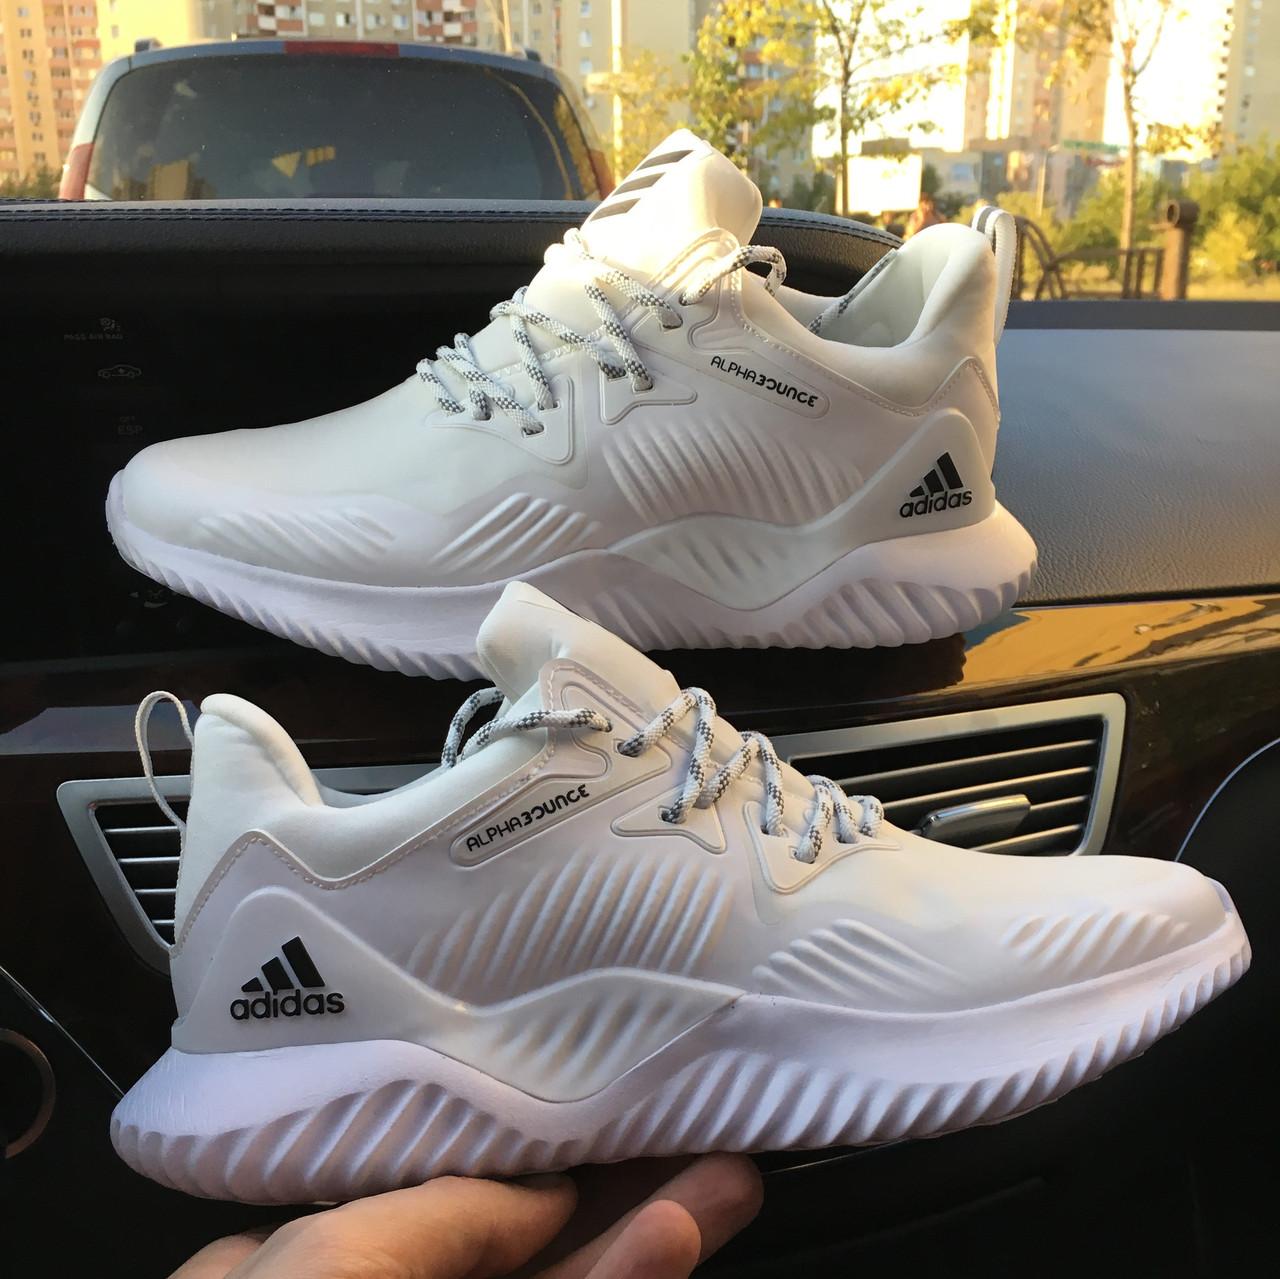 Чоловічі кросівки Adidas Alphabounce Beyond M Elastic face white black, Репліка